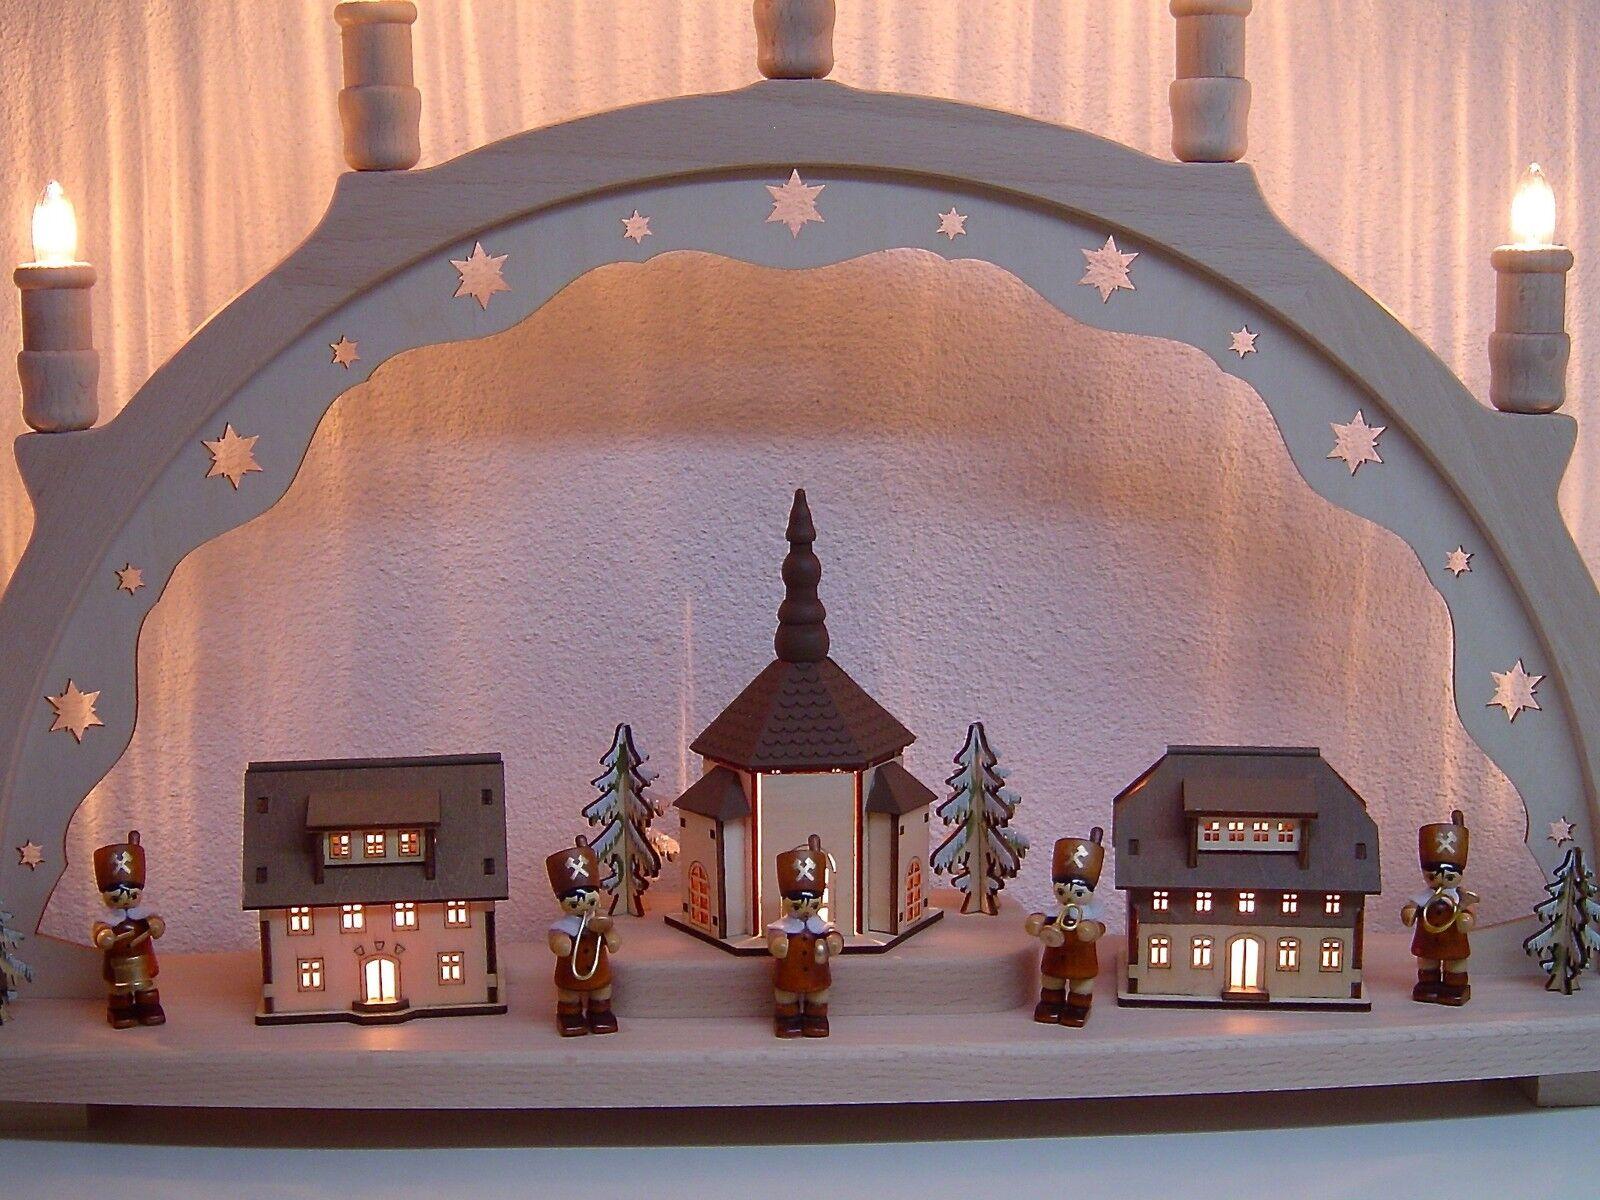 Lichterbogen Schwibbogen 3D 3D 3D Bergmann Kapelle mit 5 Bergmänner 66x41 cm 10204 | Spaß  69b7c4